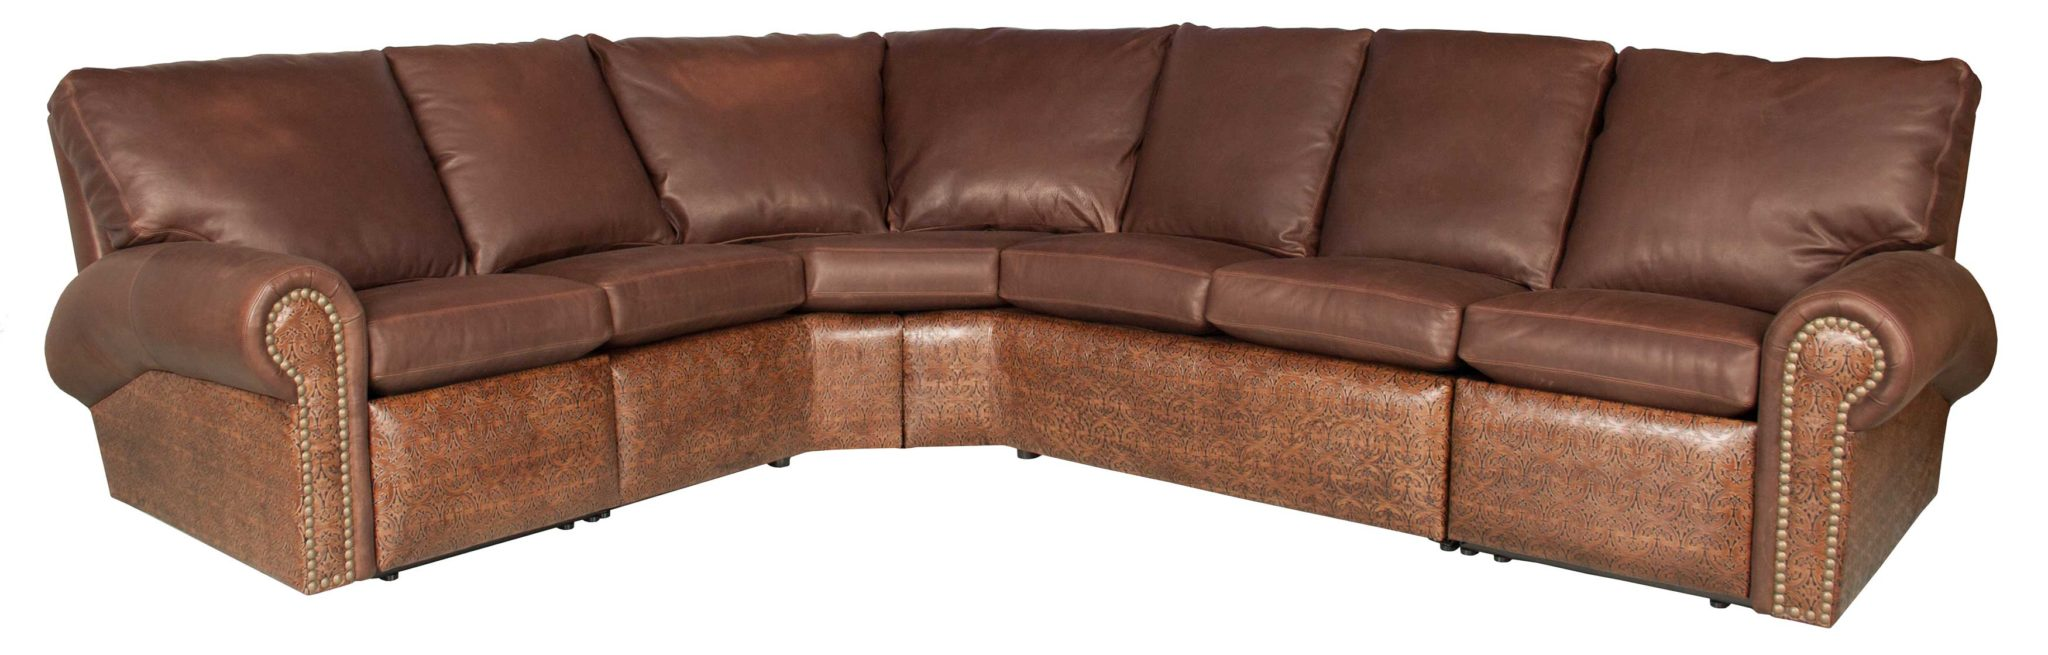 sectional sofas phoenix sofa modern 2017  reclining leather